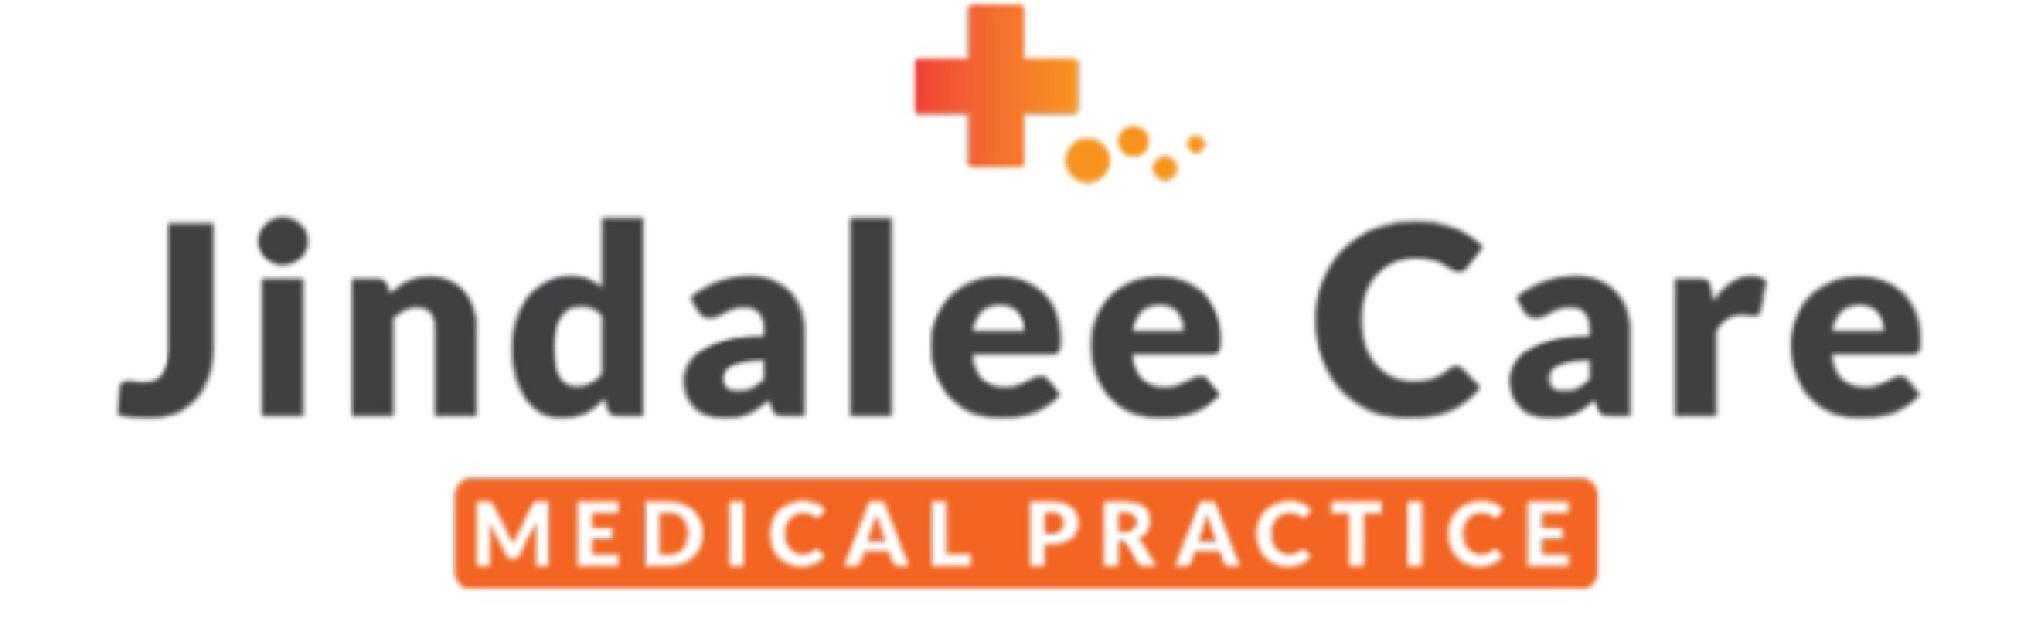 Jindalee Care Medical Practice Logo